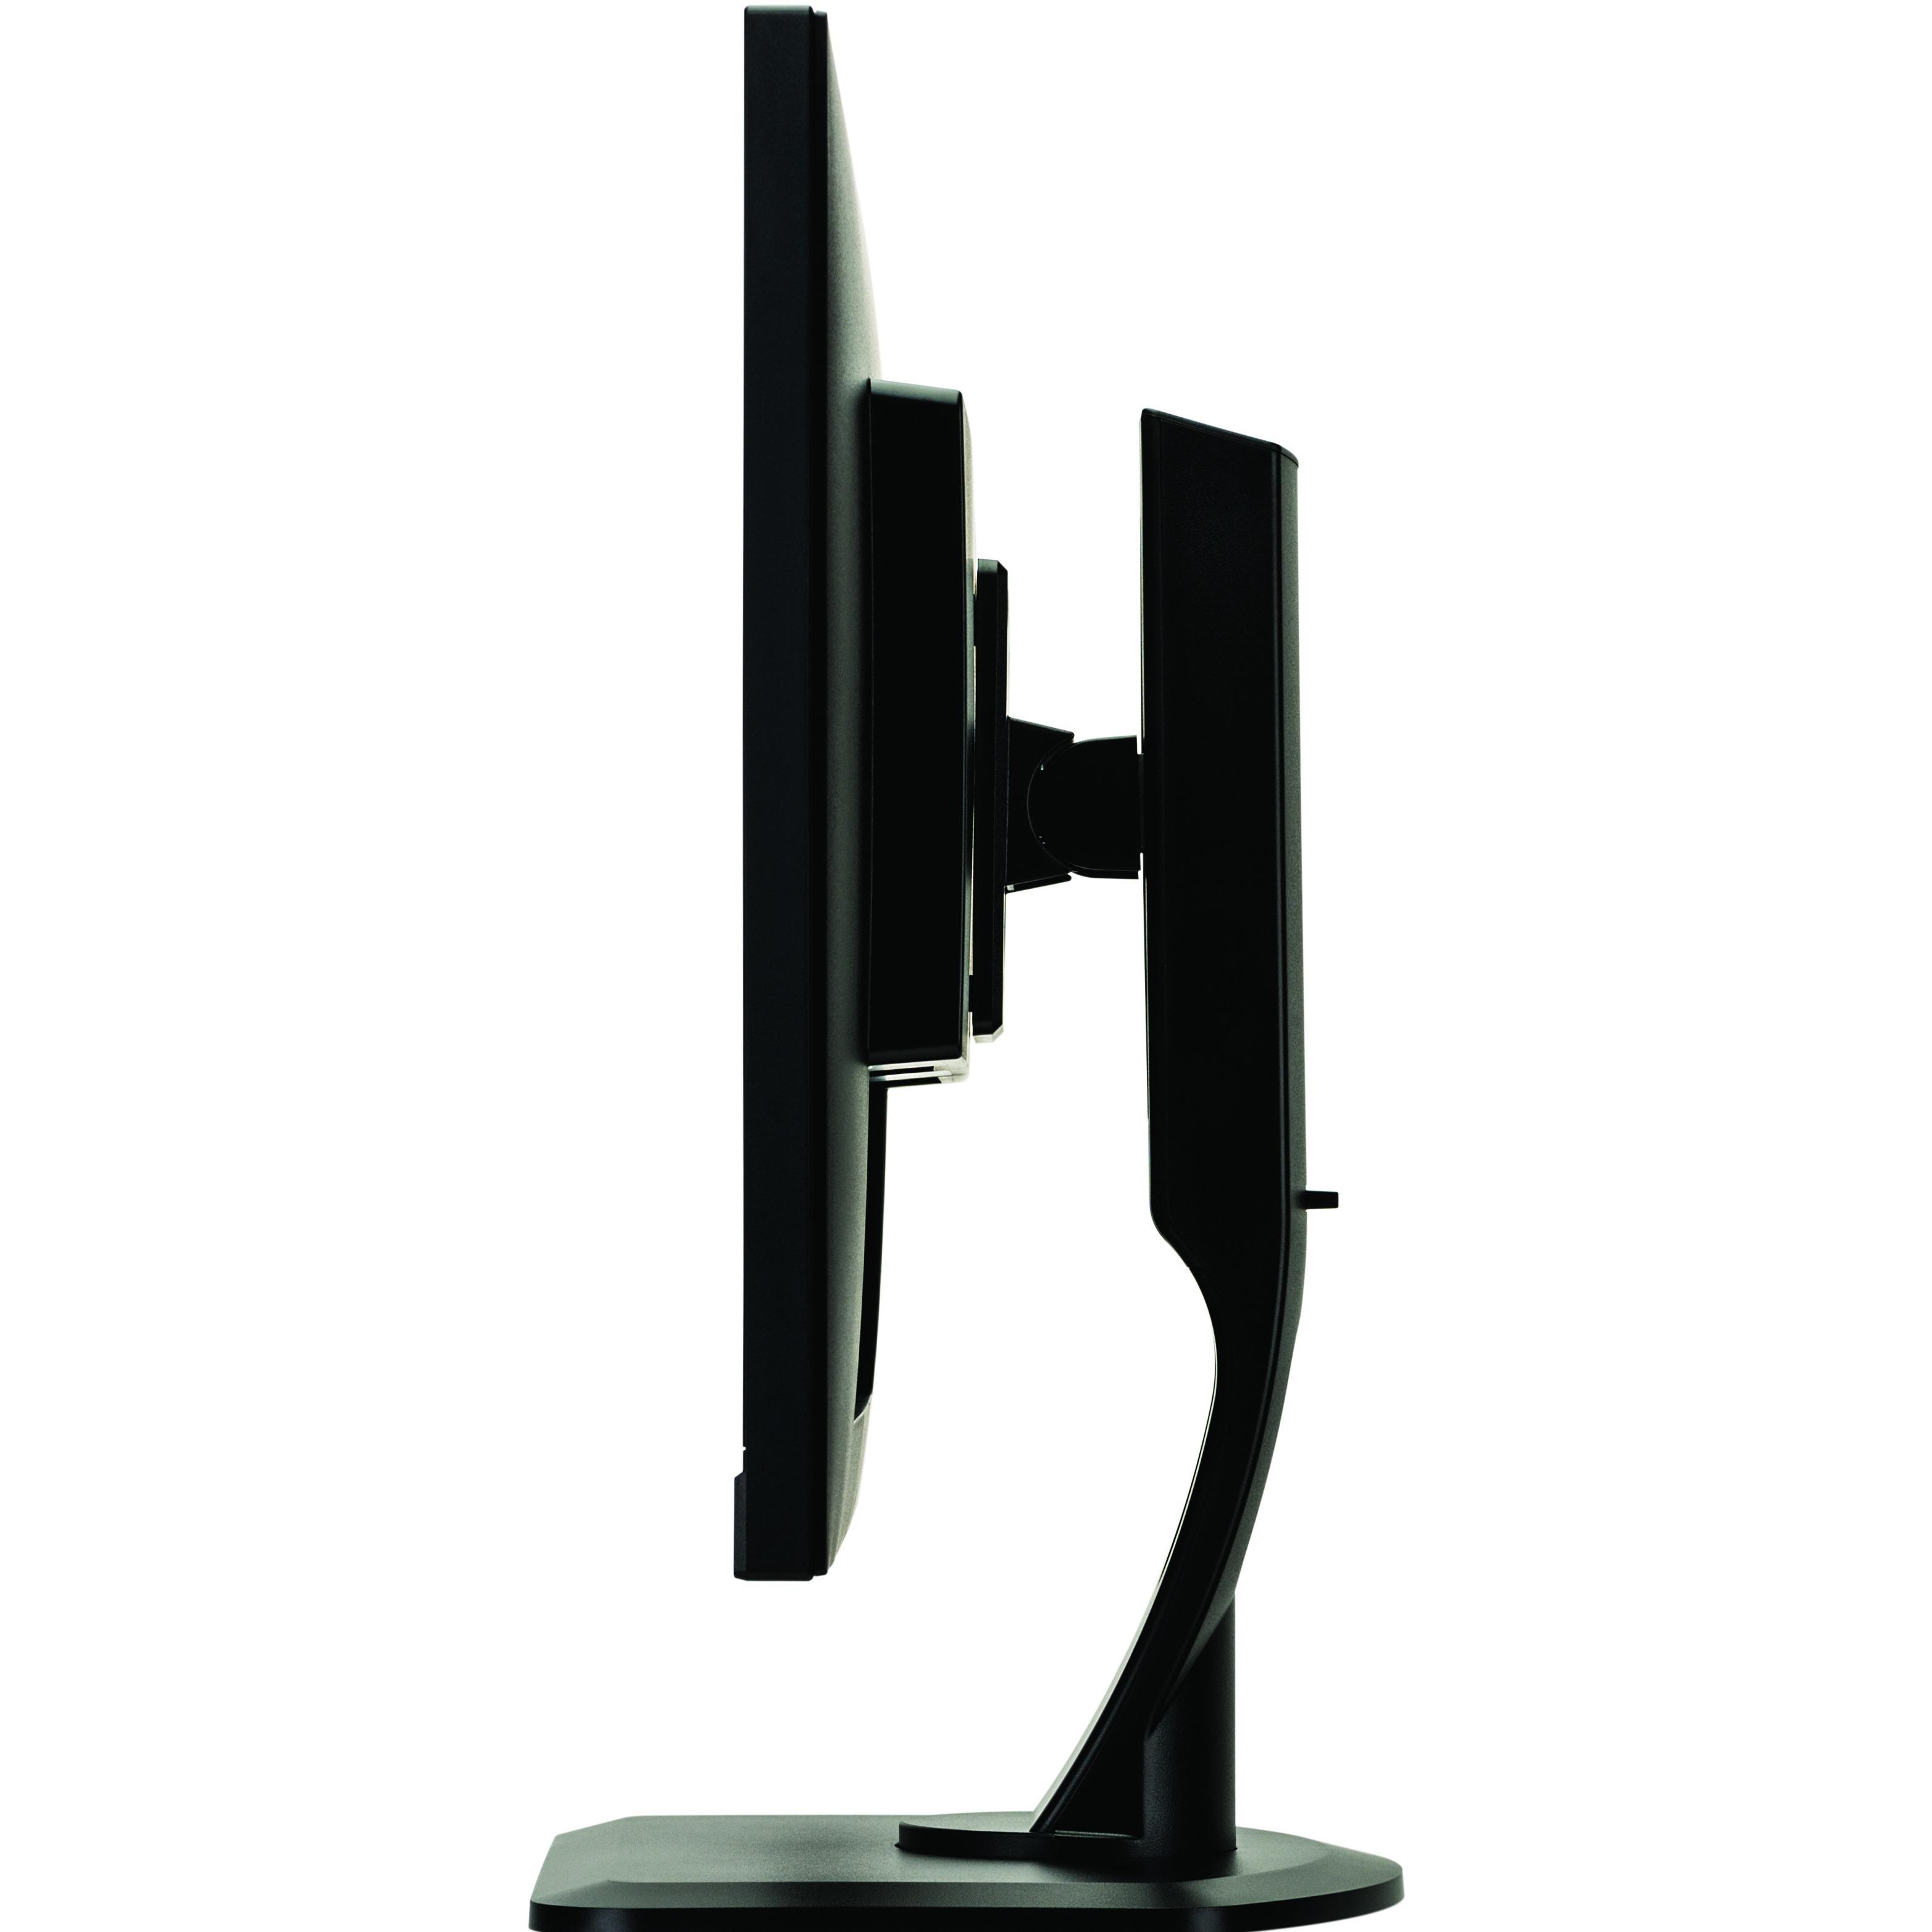 Iiyama ProLite B2791HSU-B1  27inch LCD Monitor - 16:9 - 1 ms